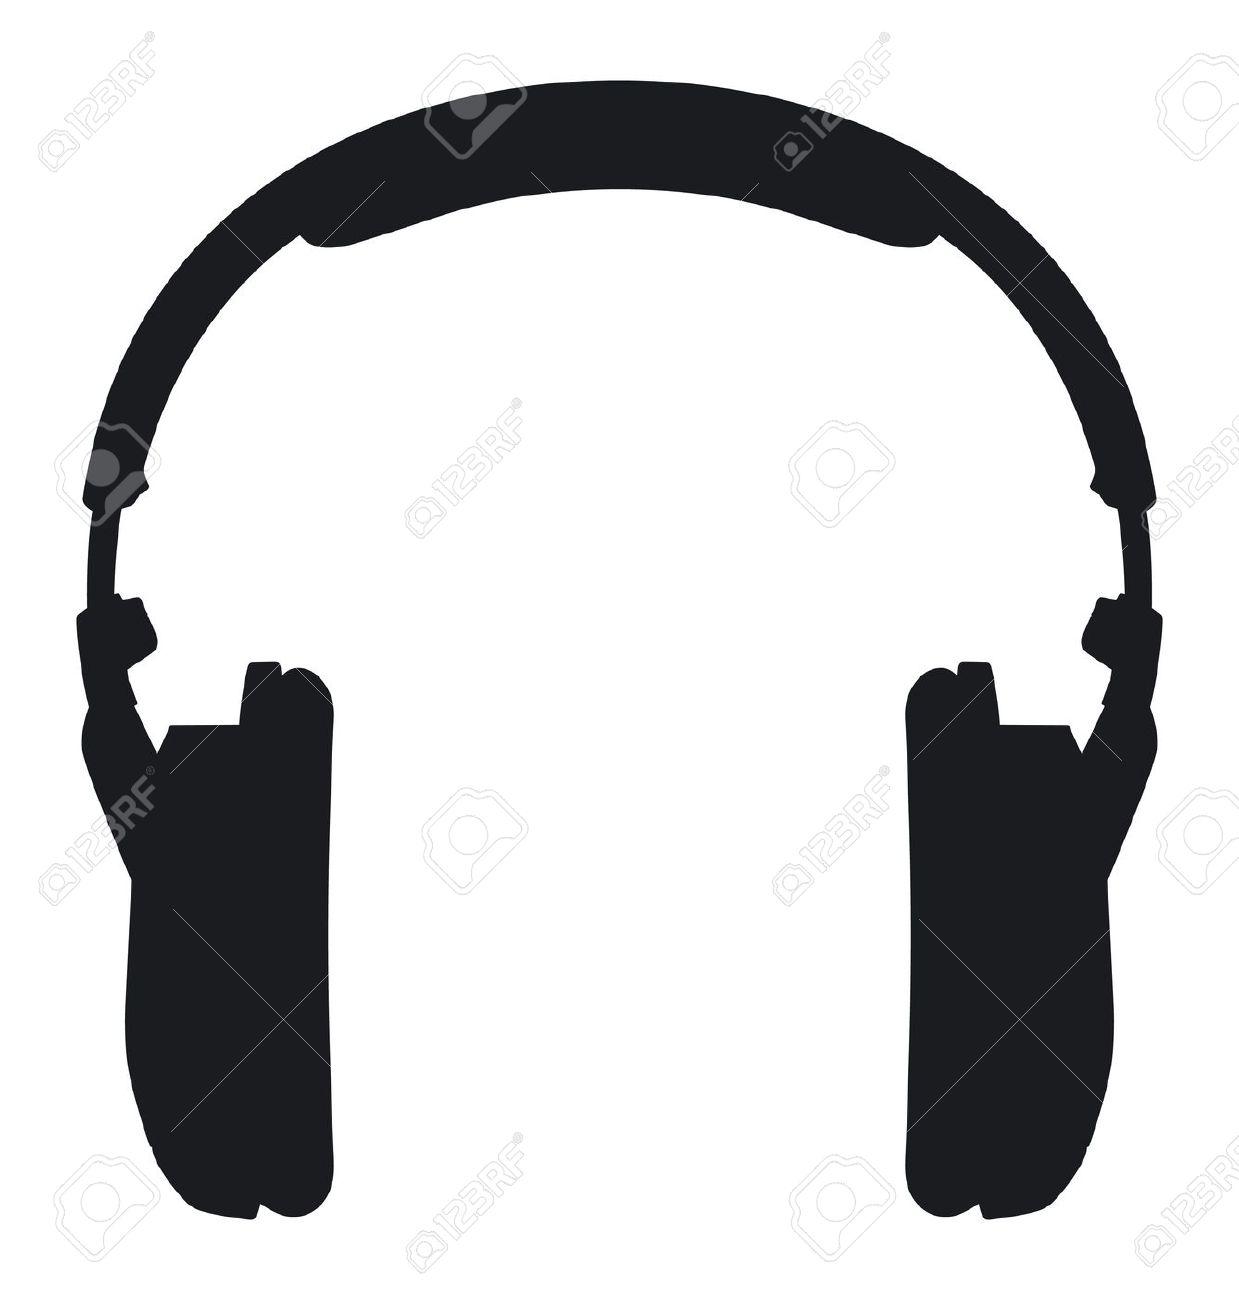 Headphones clipart #4, Download drawings